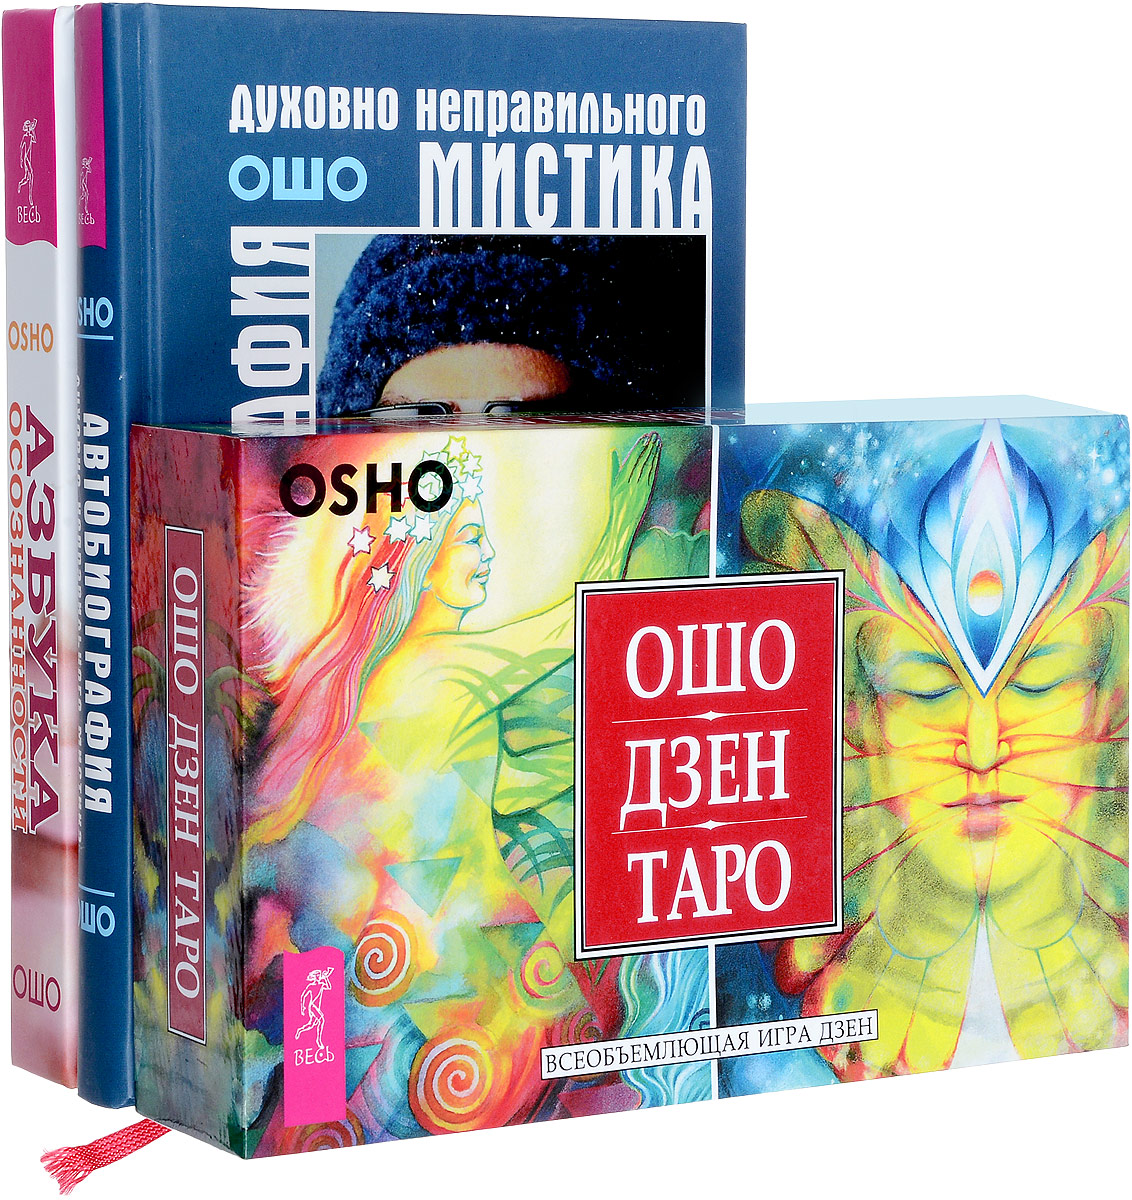 Автобиография Ошо. Азбука осознанности. Ошо Дзен Таро (комплект из 3 книг + 79 карт). Ошо